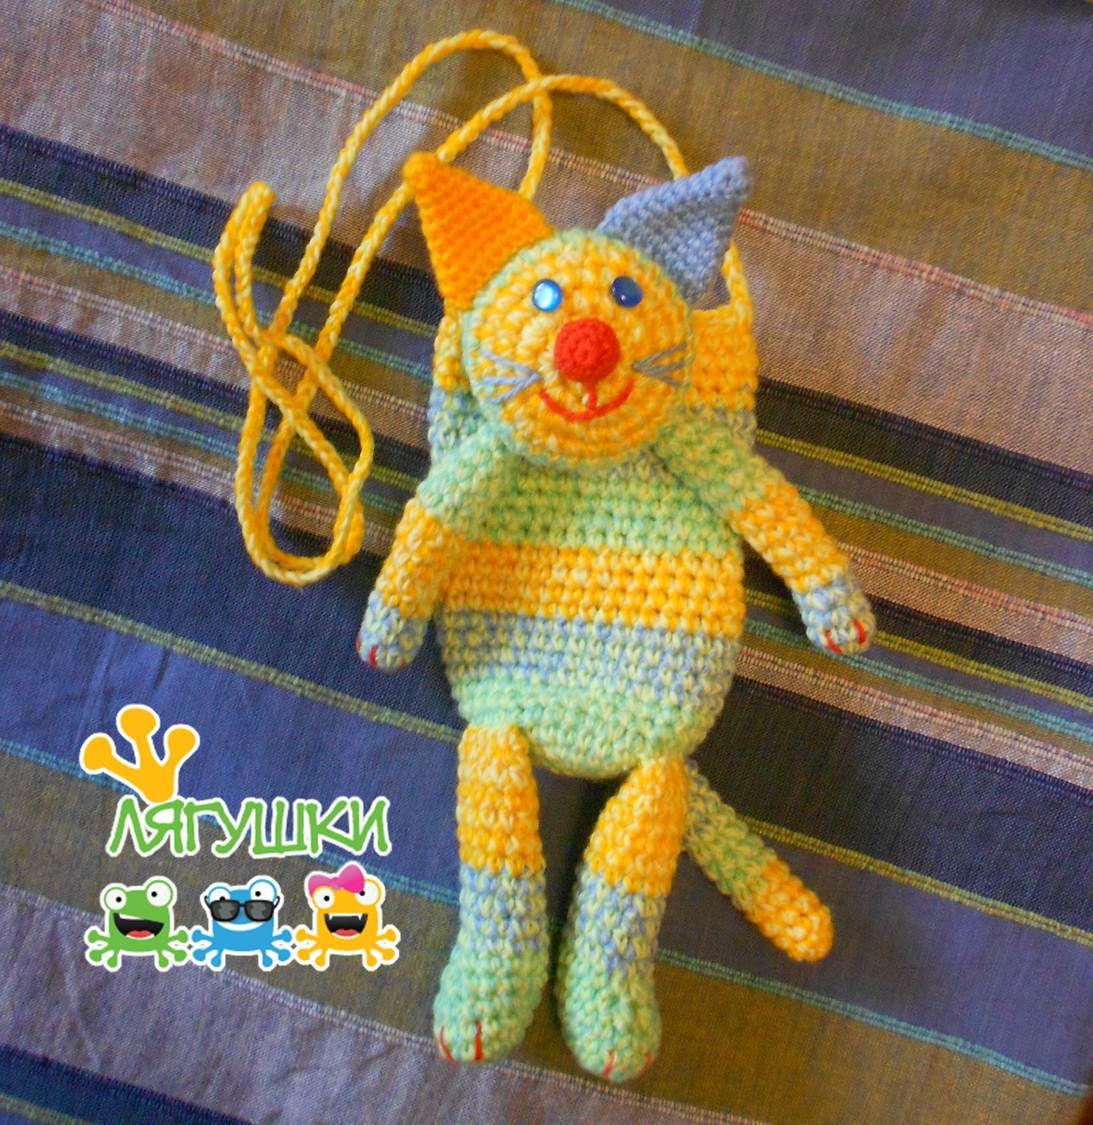 мяу forcatlovers мур gift meow вязанаясумка craft полосатыйдруг softtoybag cat мягкаяигрушка handmade трилягушки чехолдлясмартфона кот